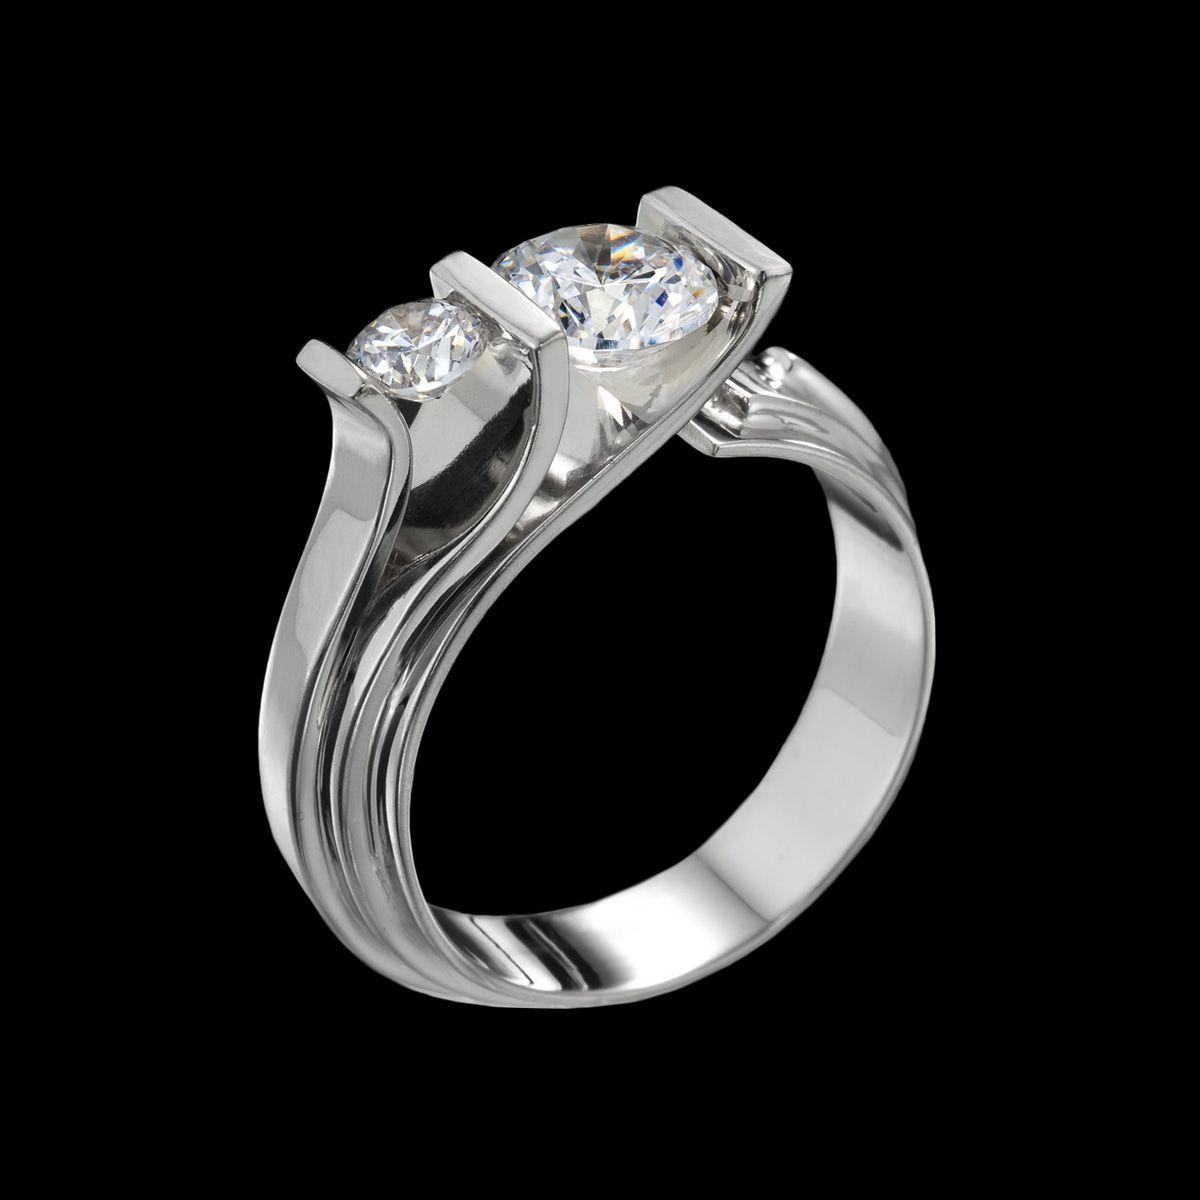 fiore diamond ring